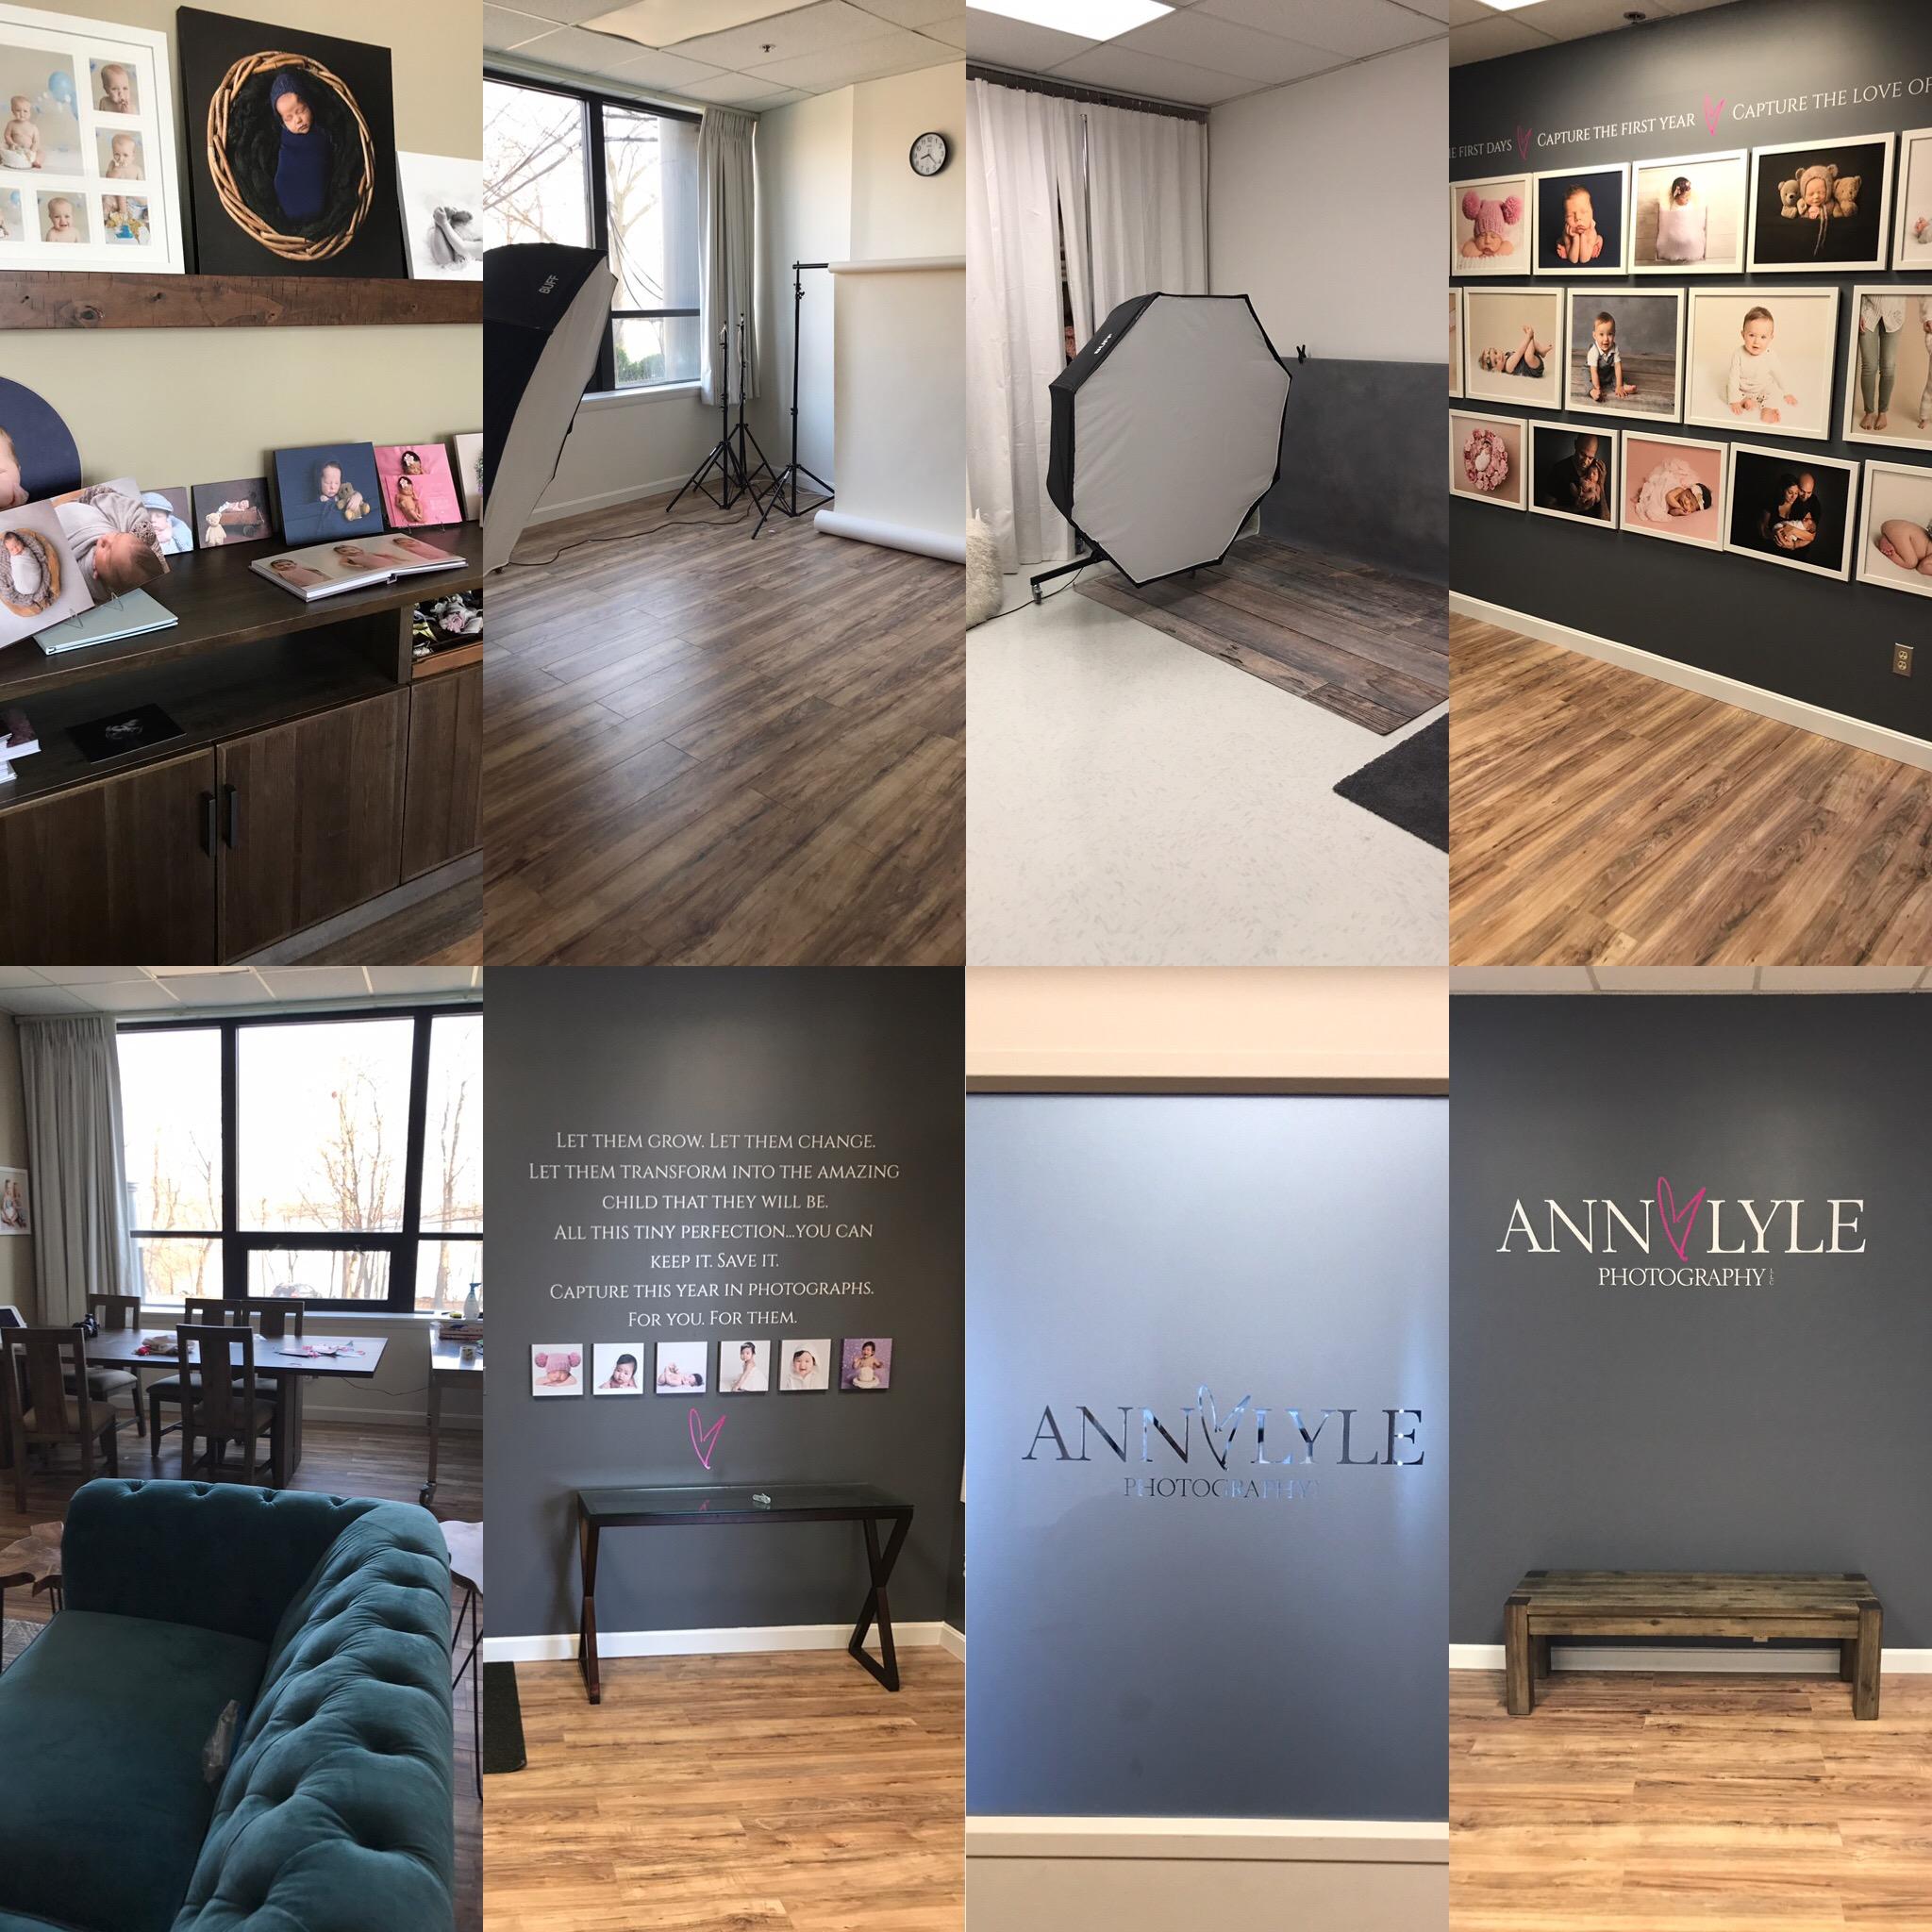 Ann Lyle's 2000 sq ft photography studio at 63 Fountain Street, Framingham, MA.